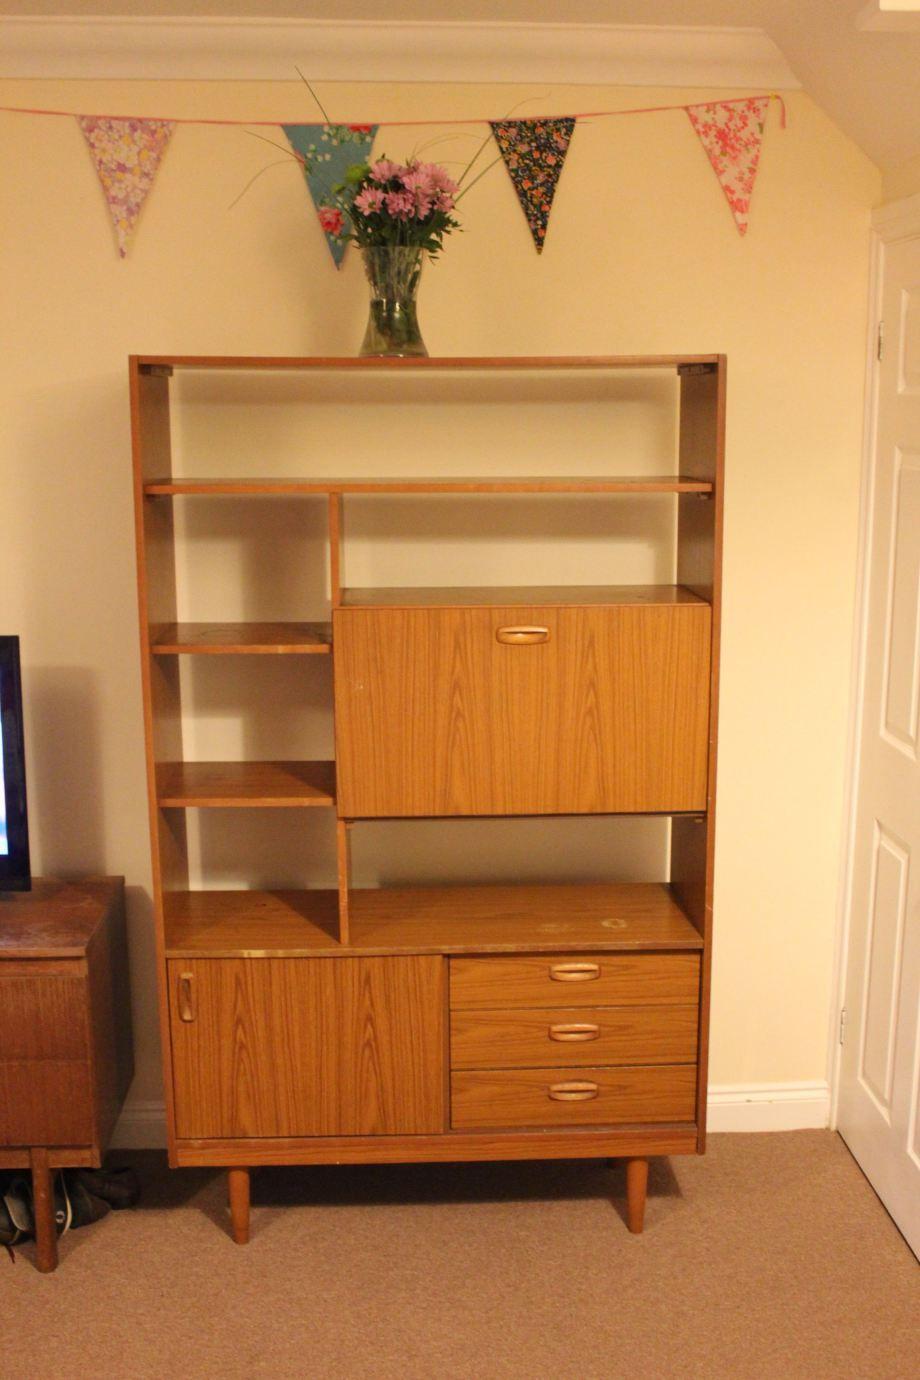 vintage 70s furniture. #Schreiber #vintage #60s #70s #furniture #wood #upcycle Vintage 70s Furniture A